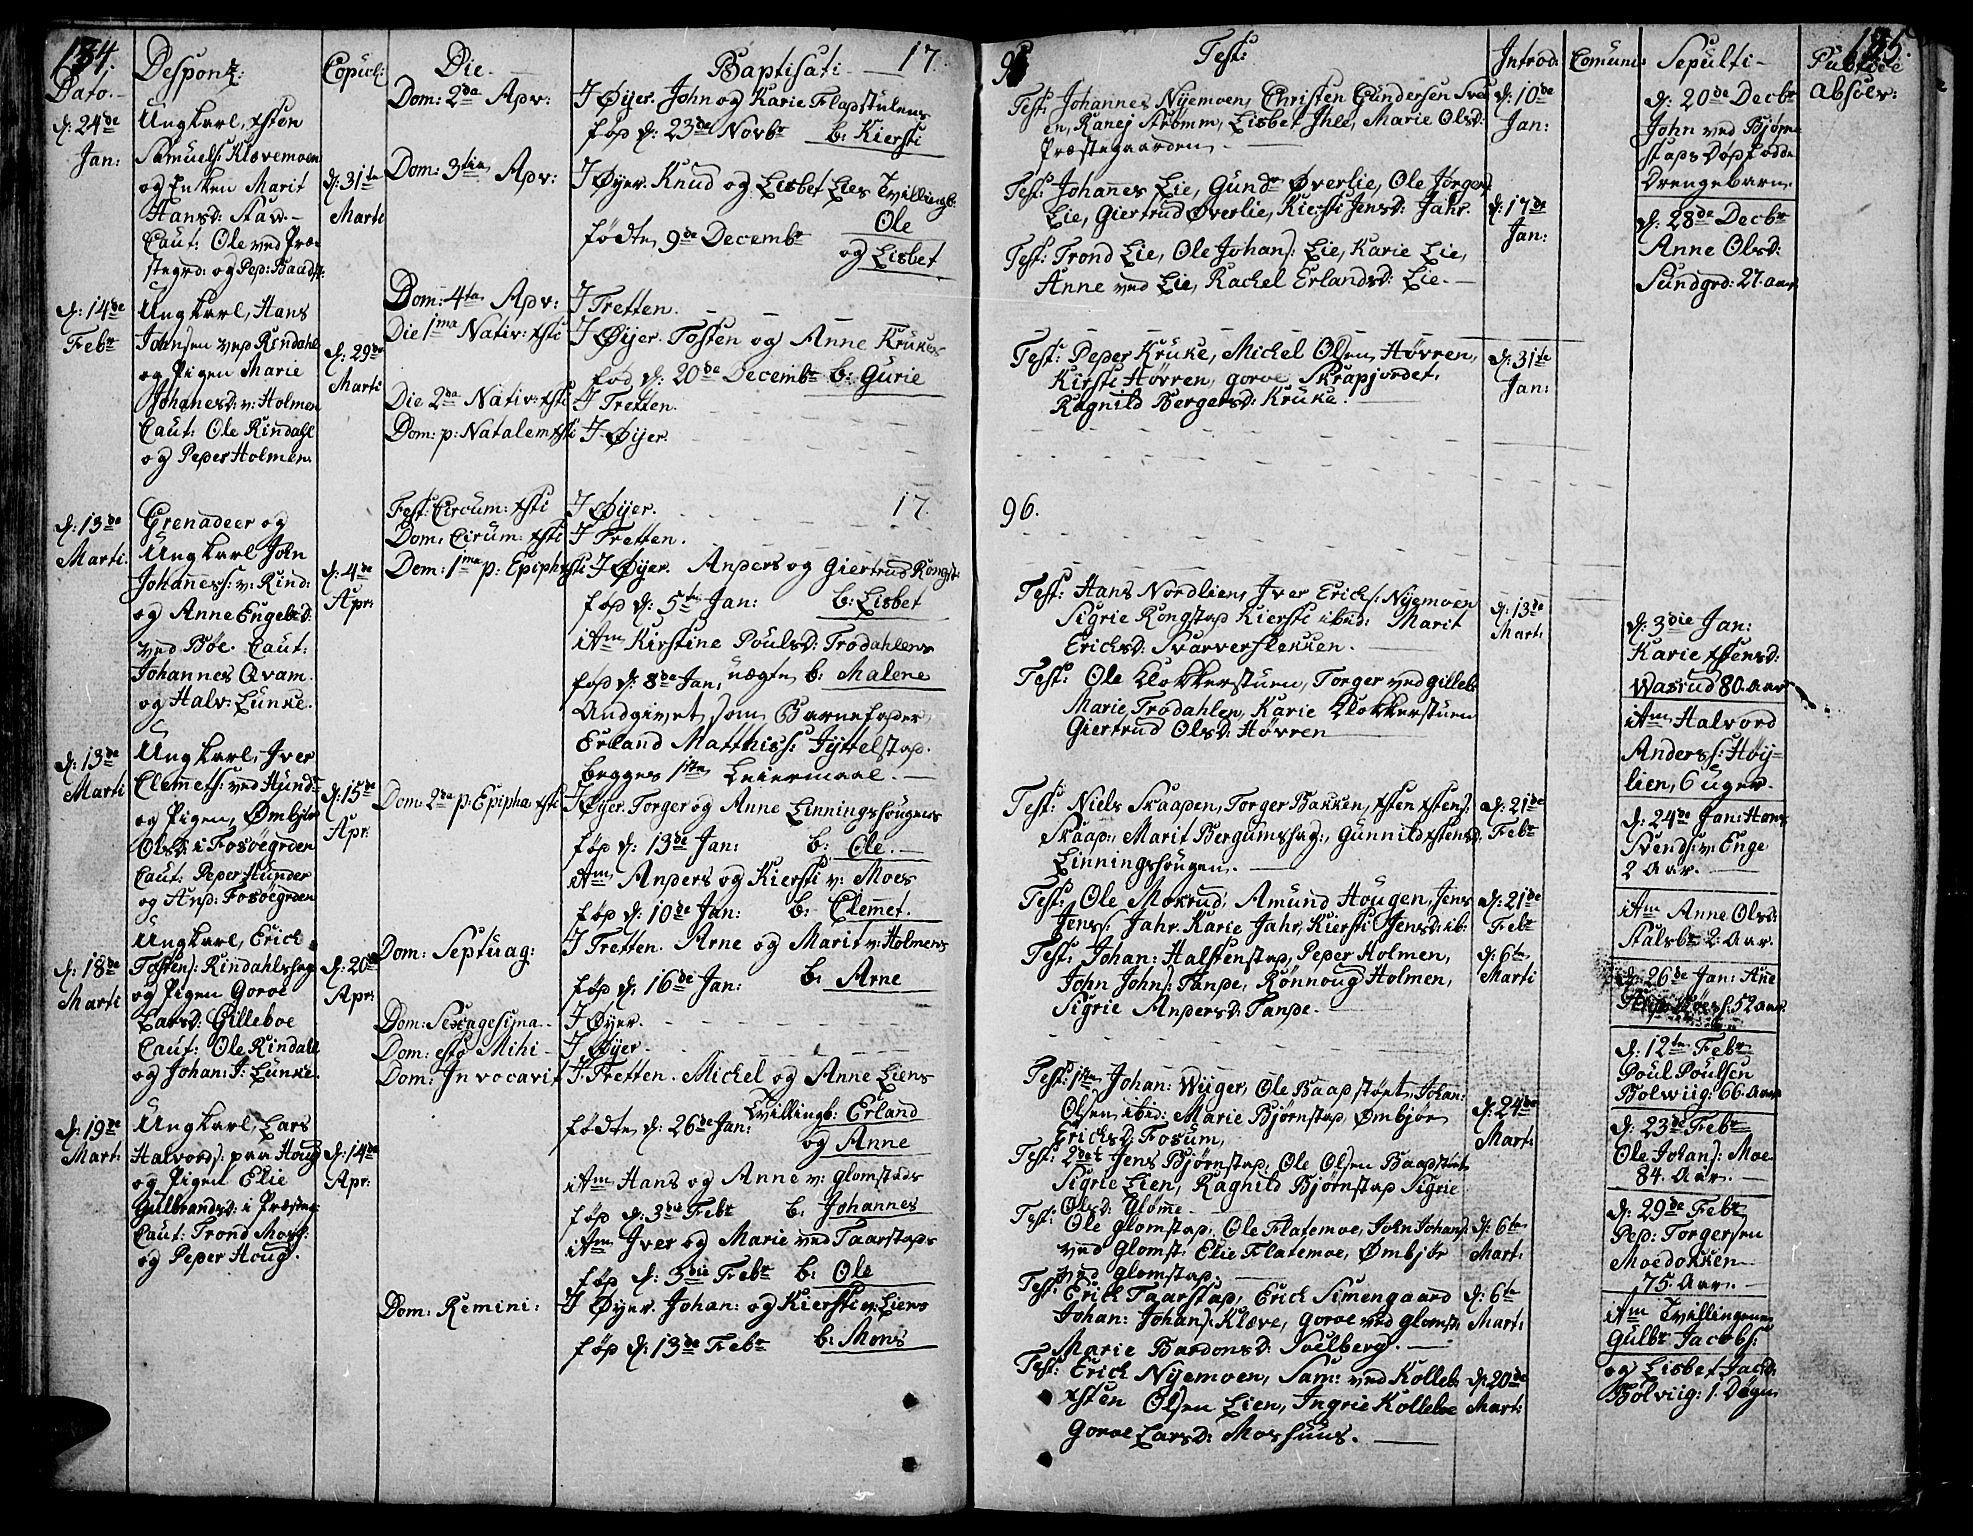 SAH, Øyer prestekontor, Ministerialbok nr. 3, 1784-1824, s. 134-135